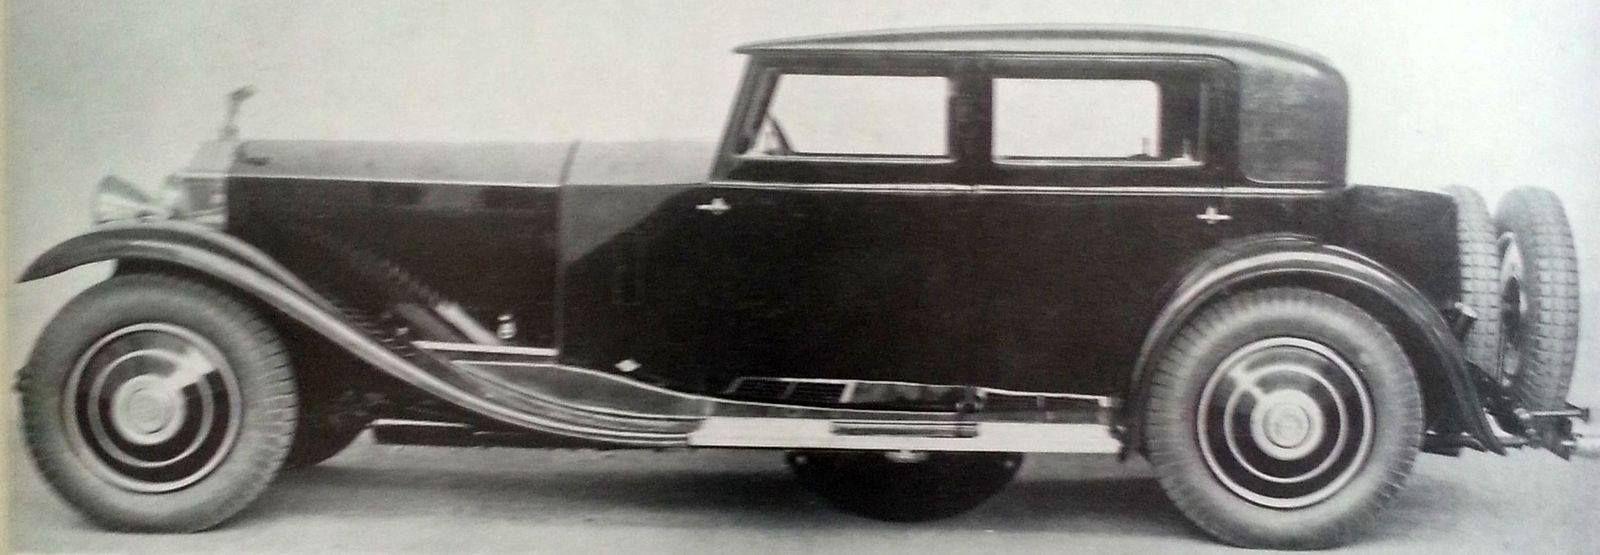 1930 Saloon by Kellner (chassis 41GX) for J. Rubin